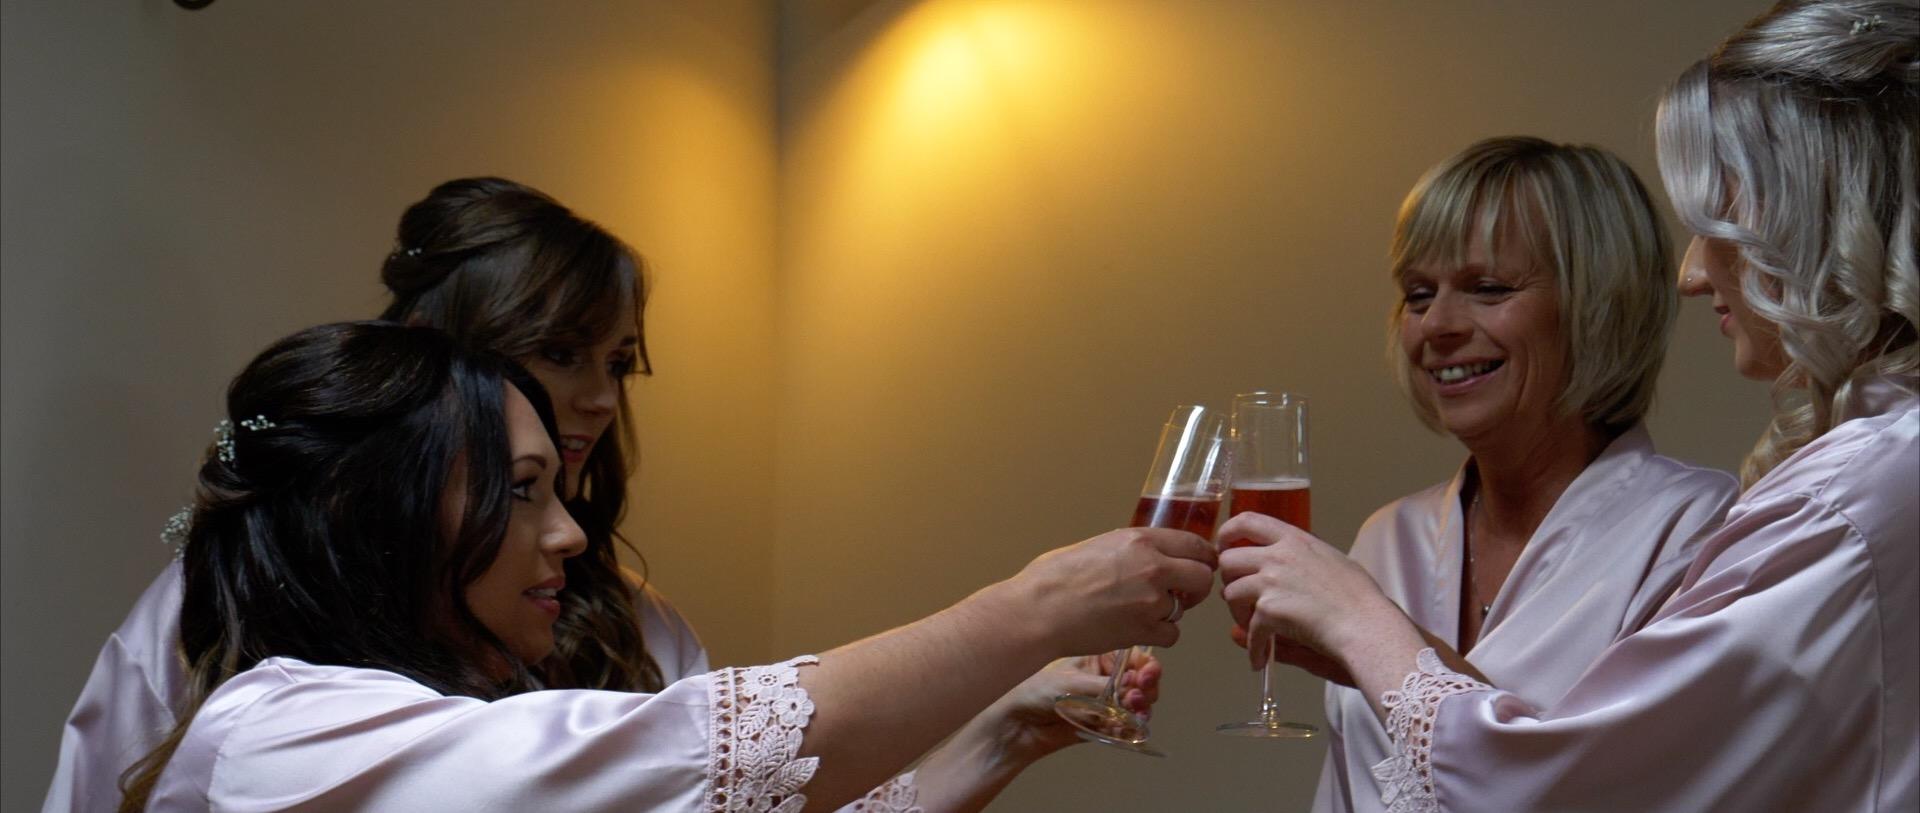 Apton Hall Wedding Bridal Preparation Video.jpg